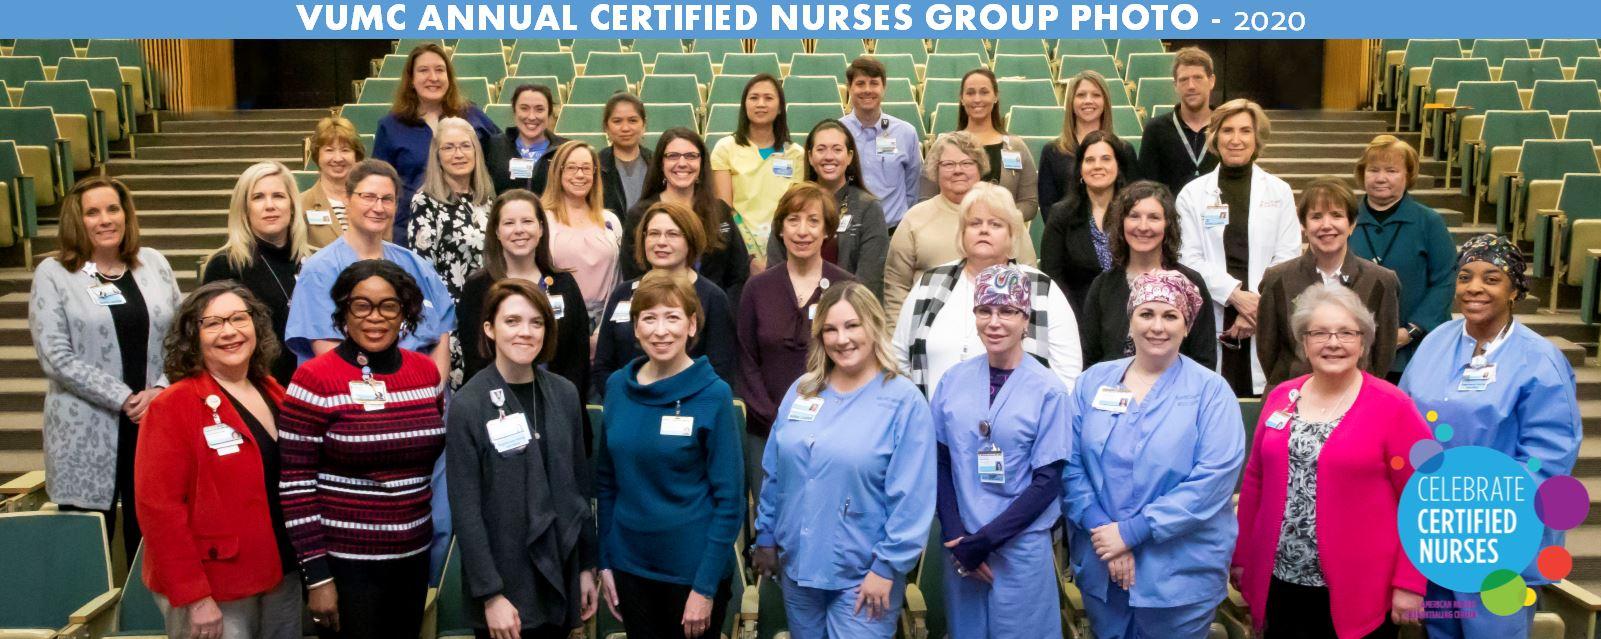 2020 Certified Nurses